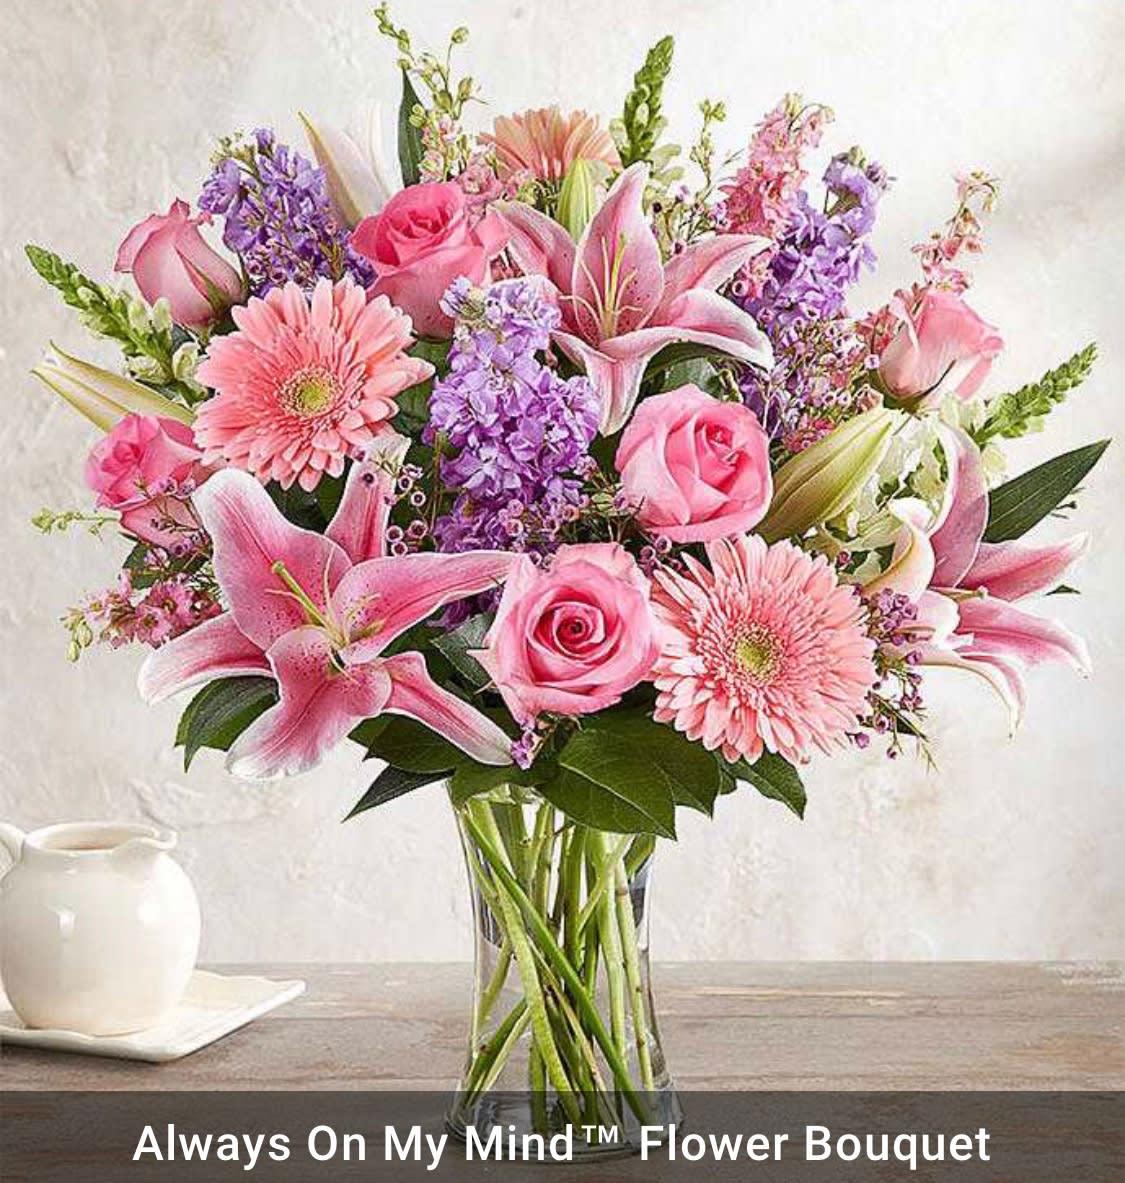 Always On My Mind Flower Bouquet In Whitinsville Ma The Flower Shop